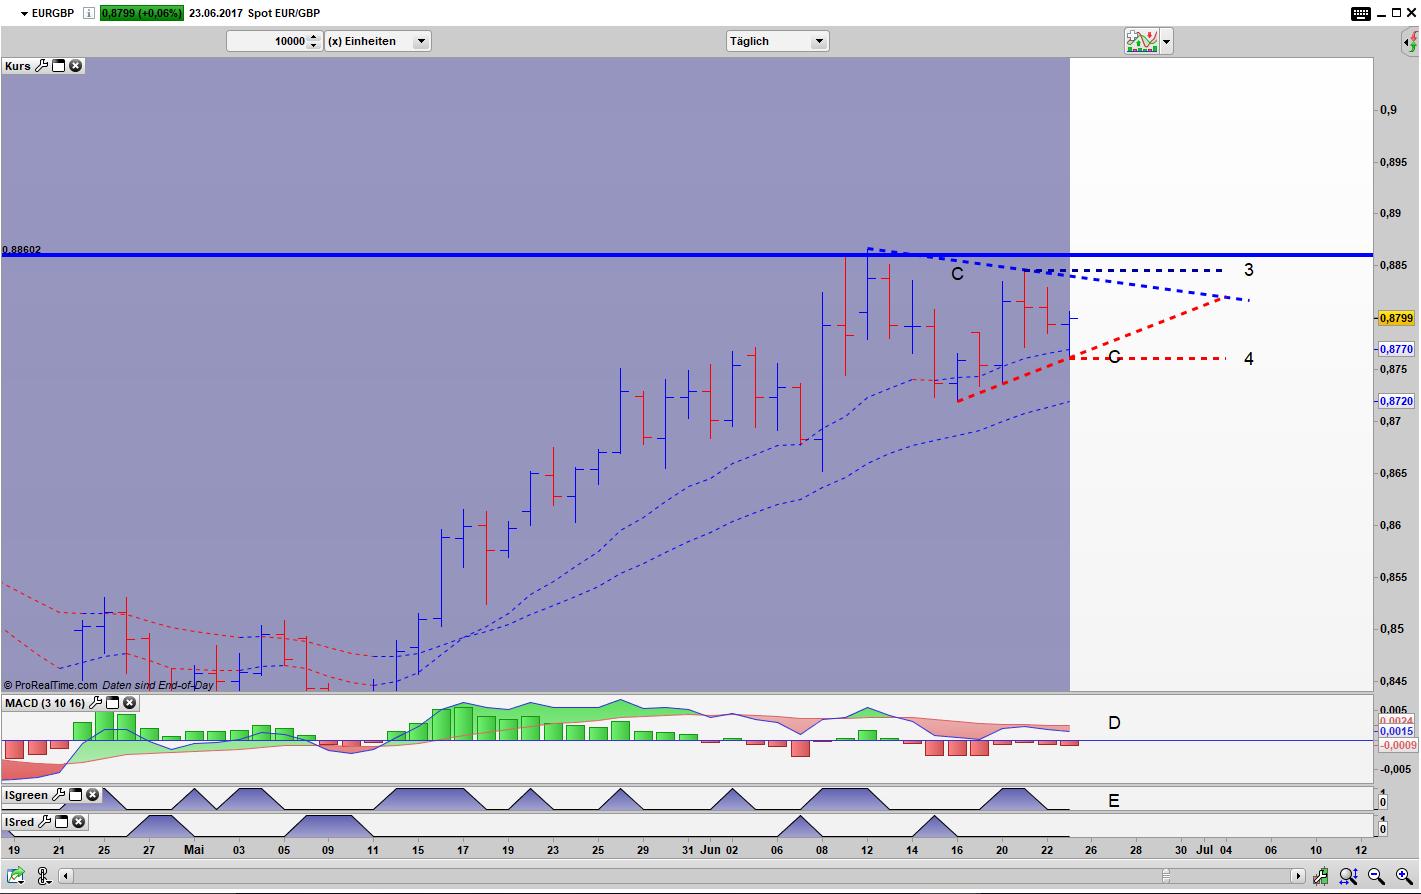 EUR/GBP Tages Bar Chart: Dreieck